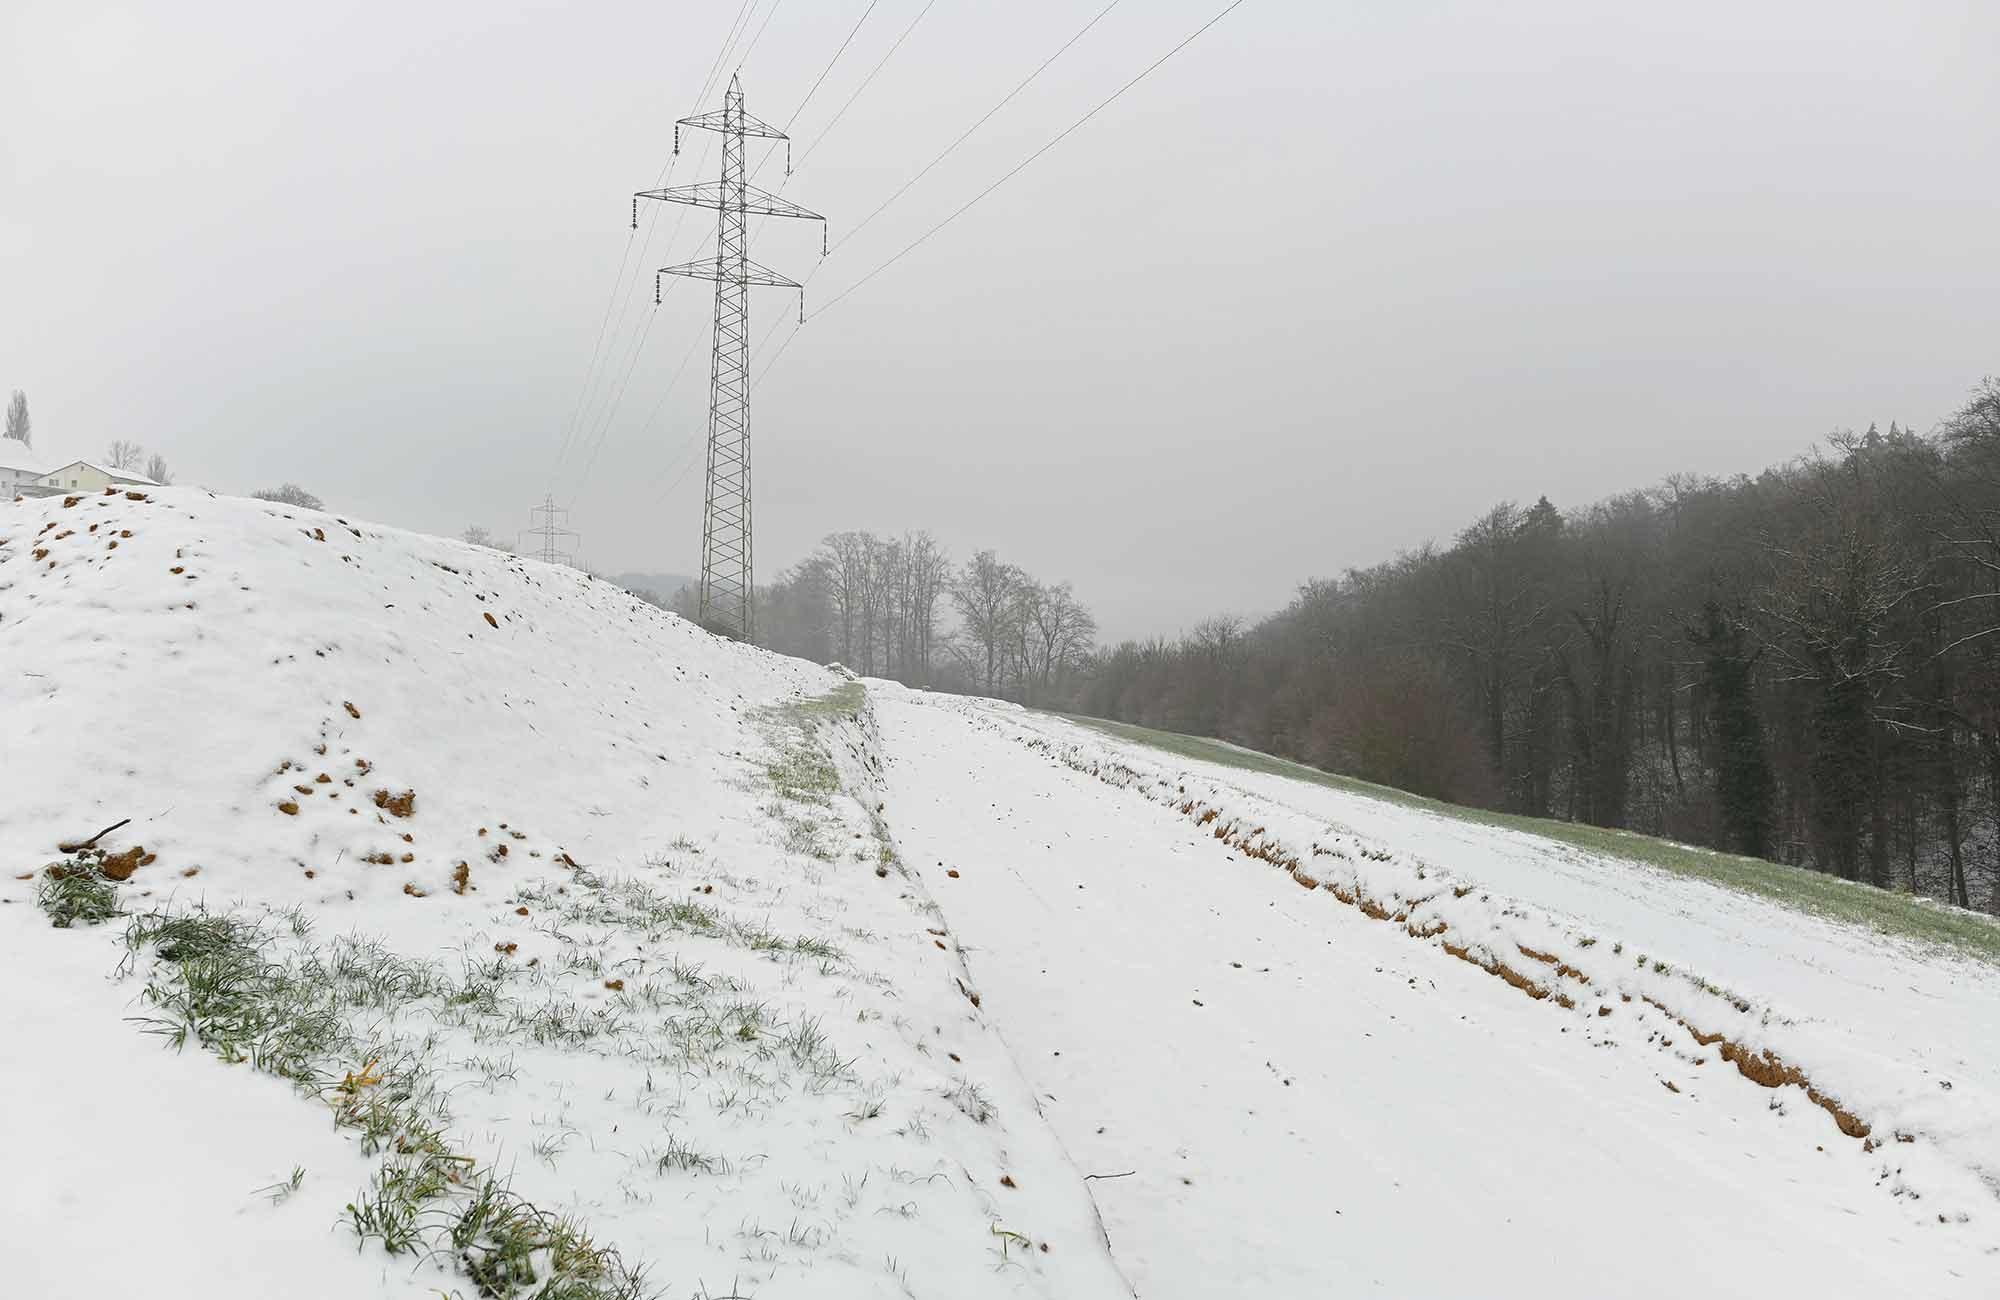 Swissgrid Übergangsbauwerk Bözbergstr Gäbihübel